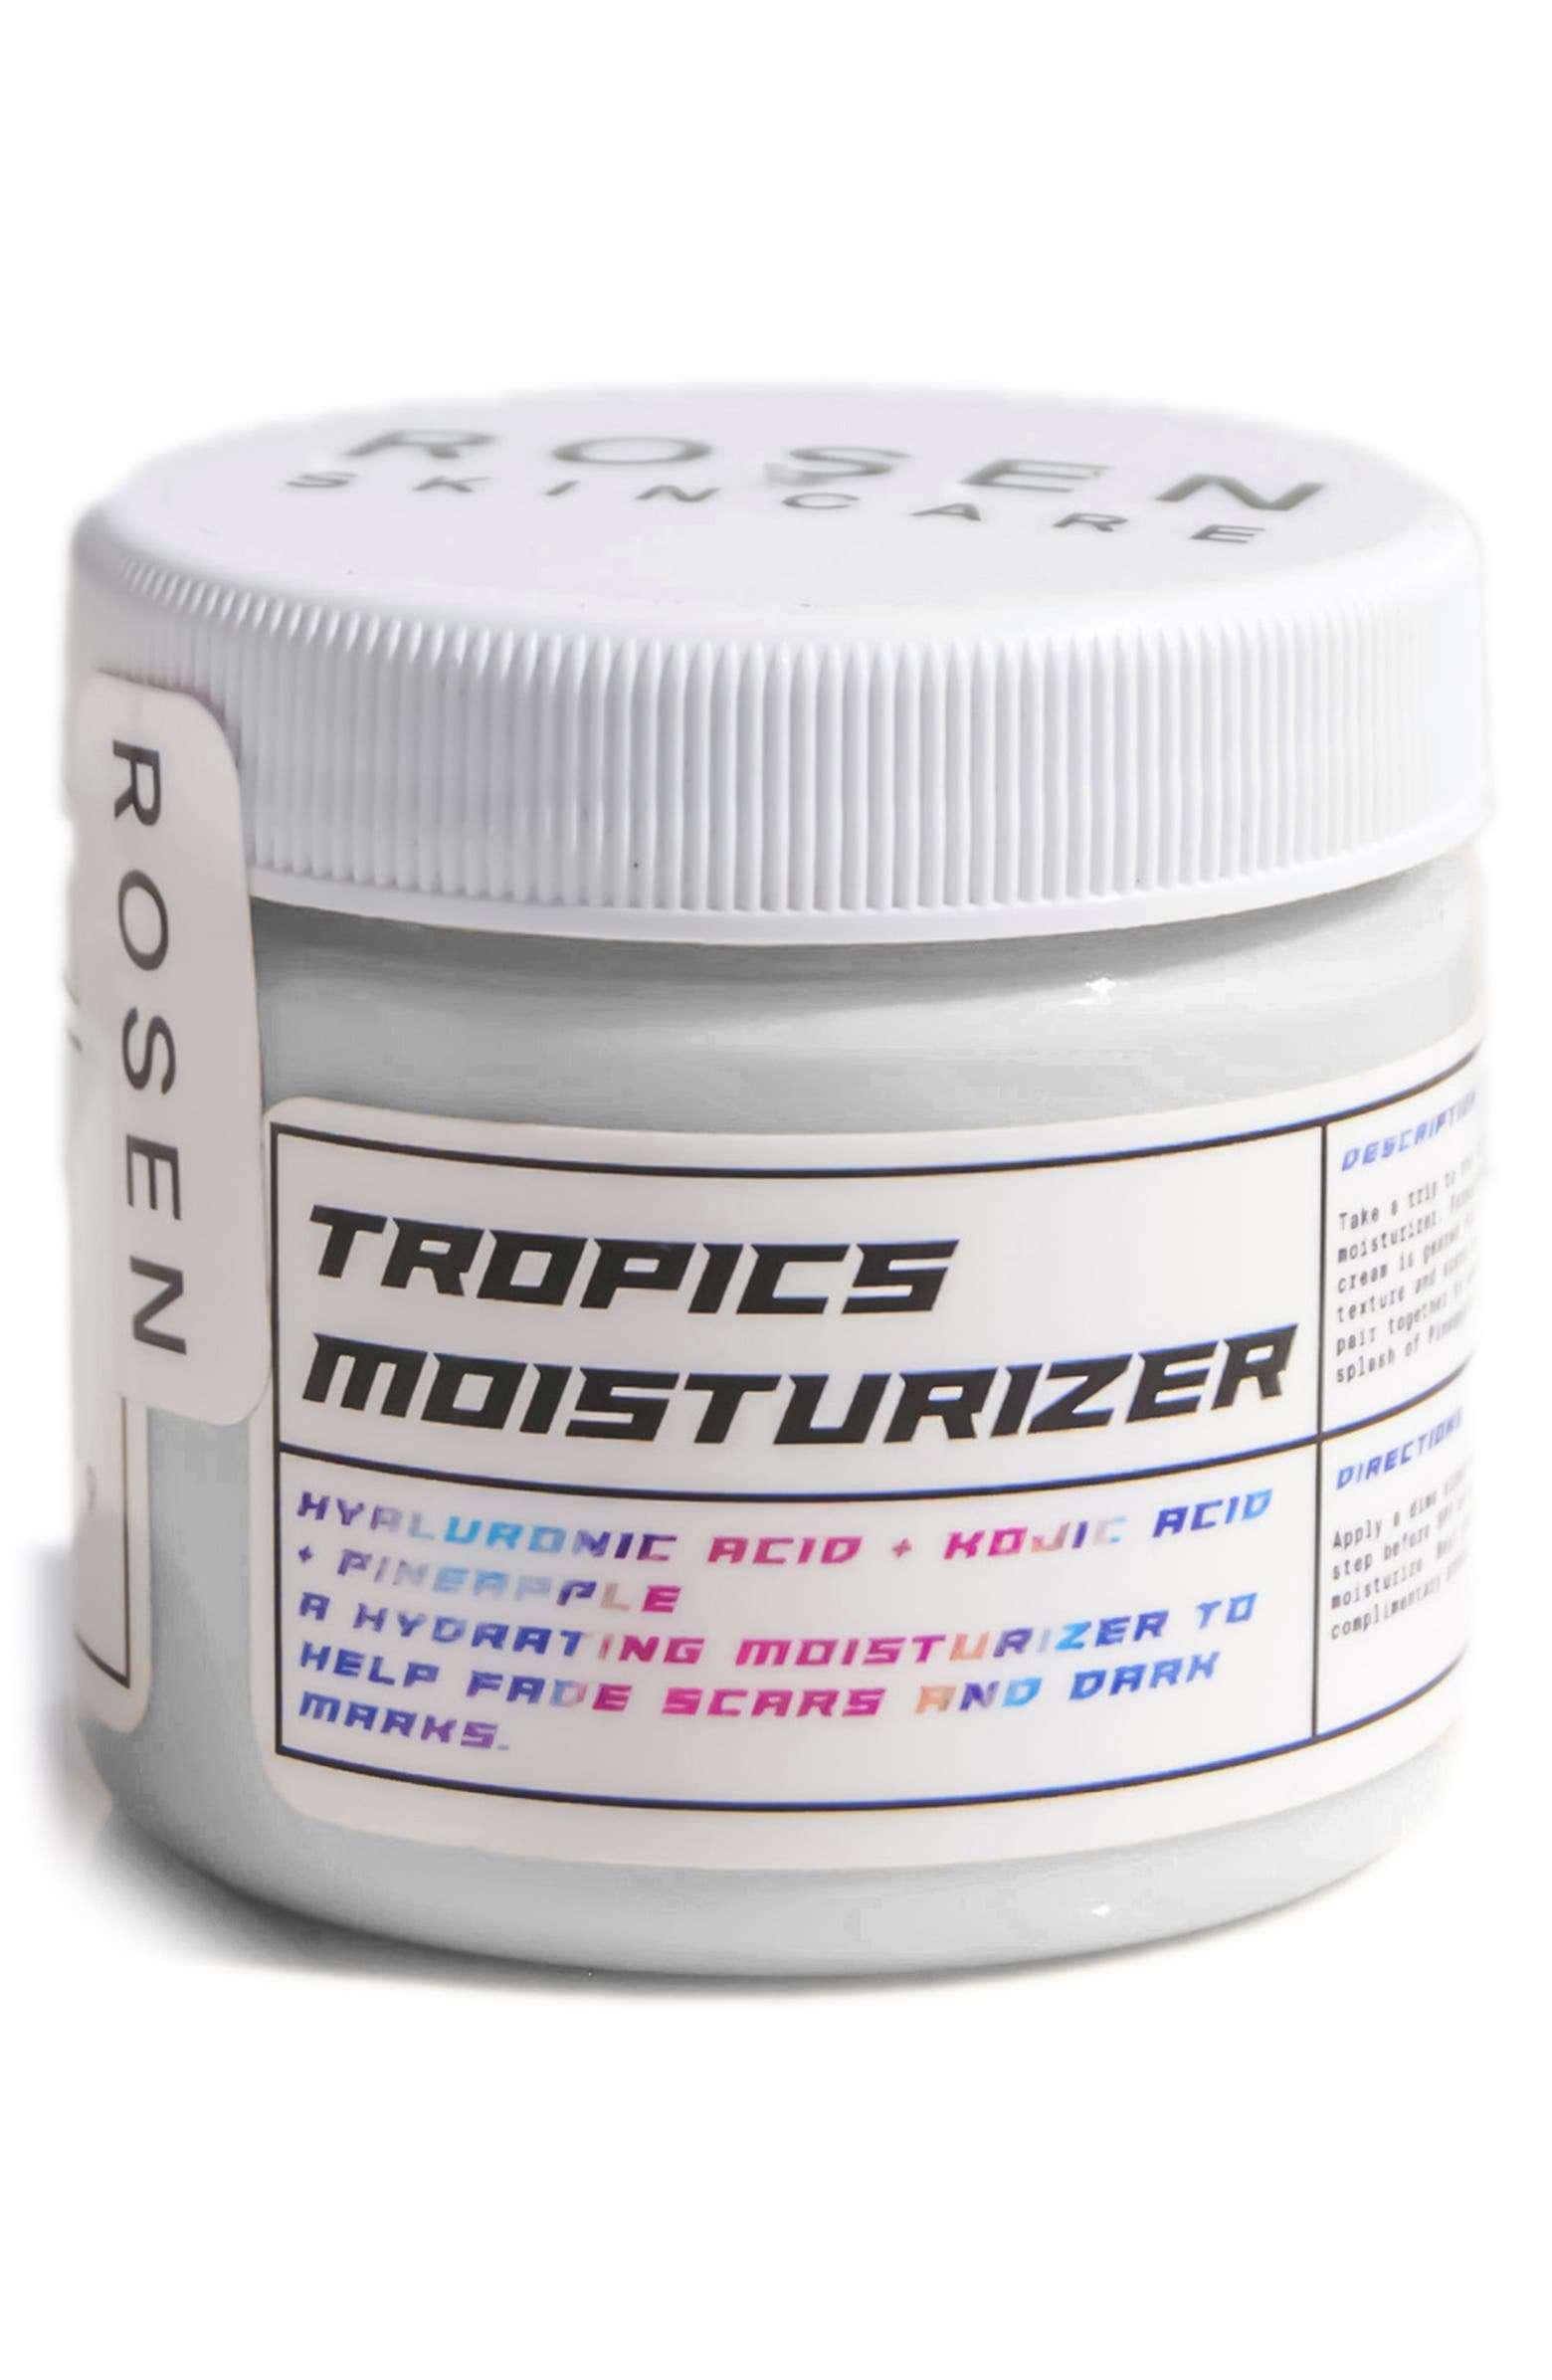 Rosen Skincare Tropics Moisturizer